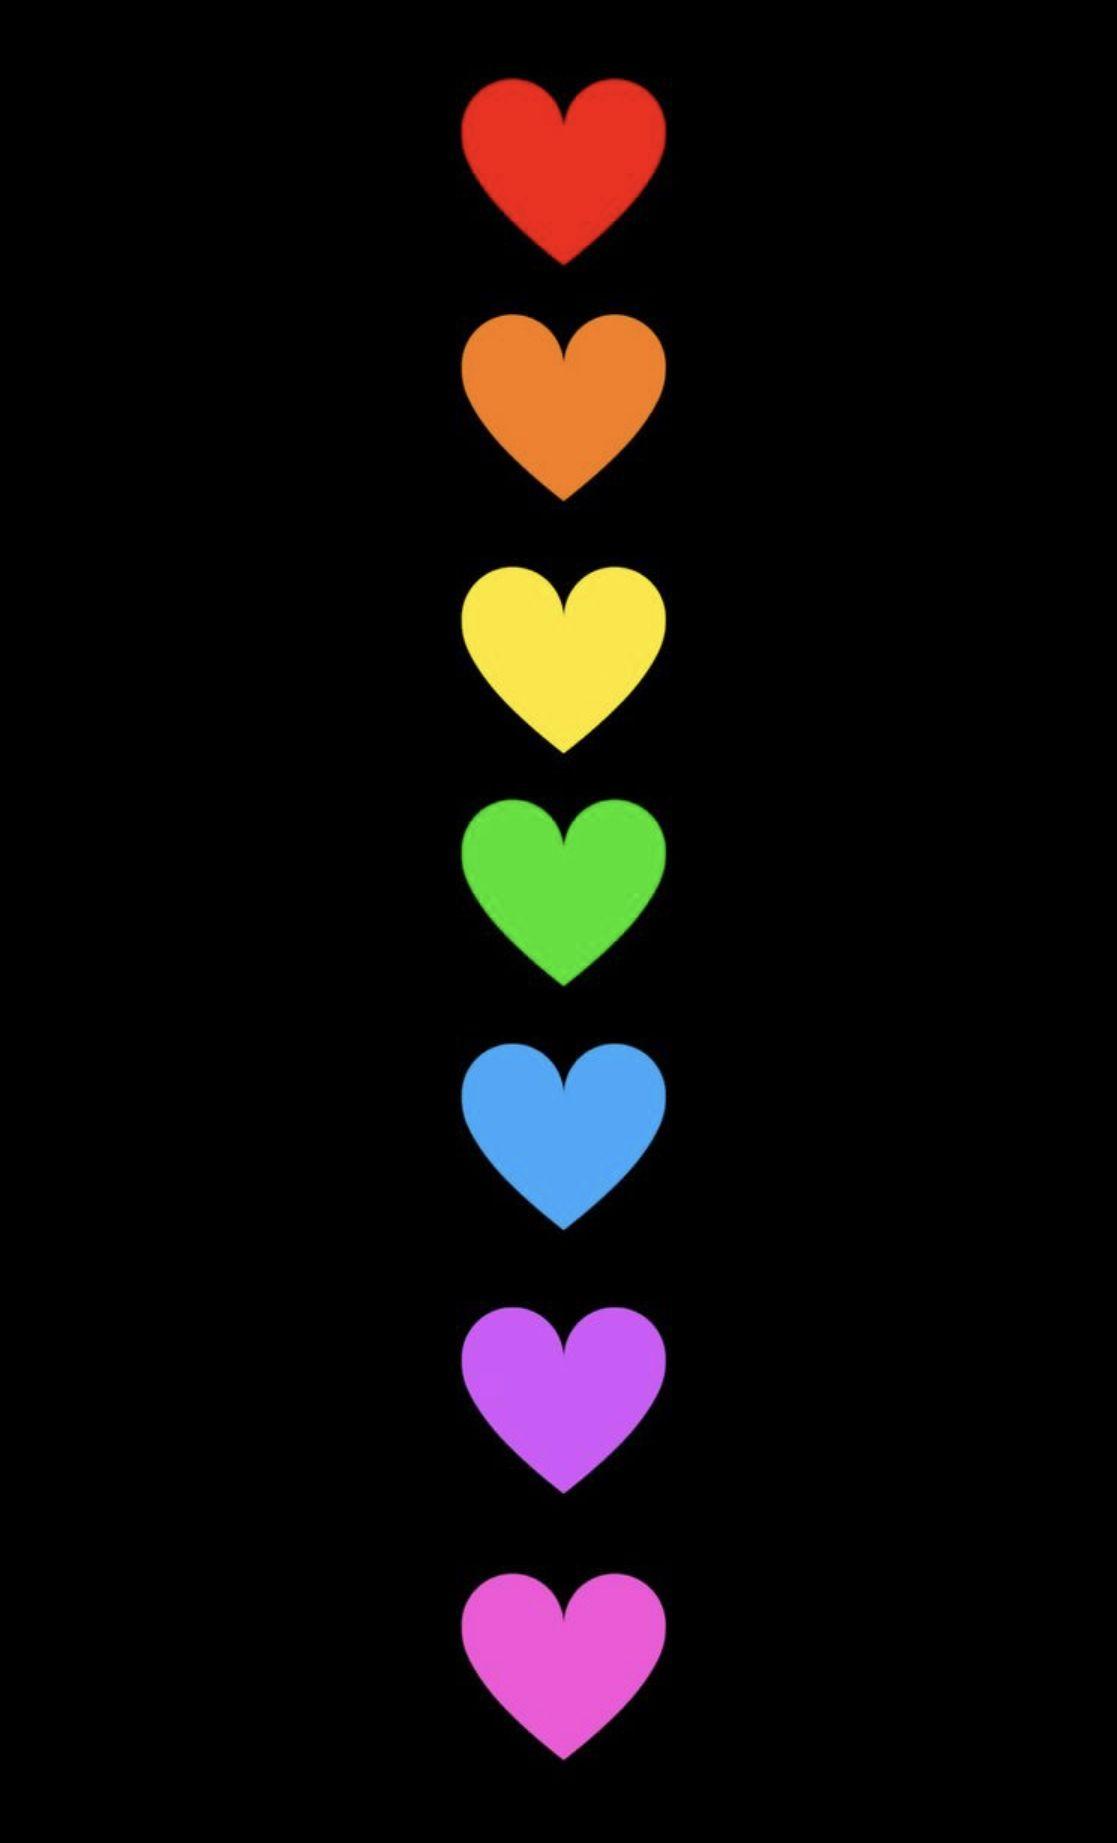 Wallpaper Rainbow Heart Black Background